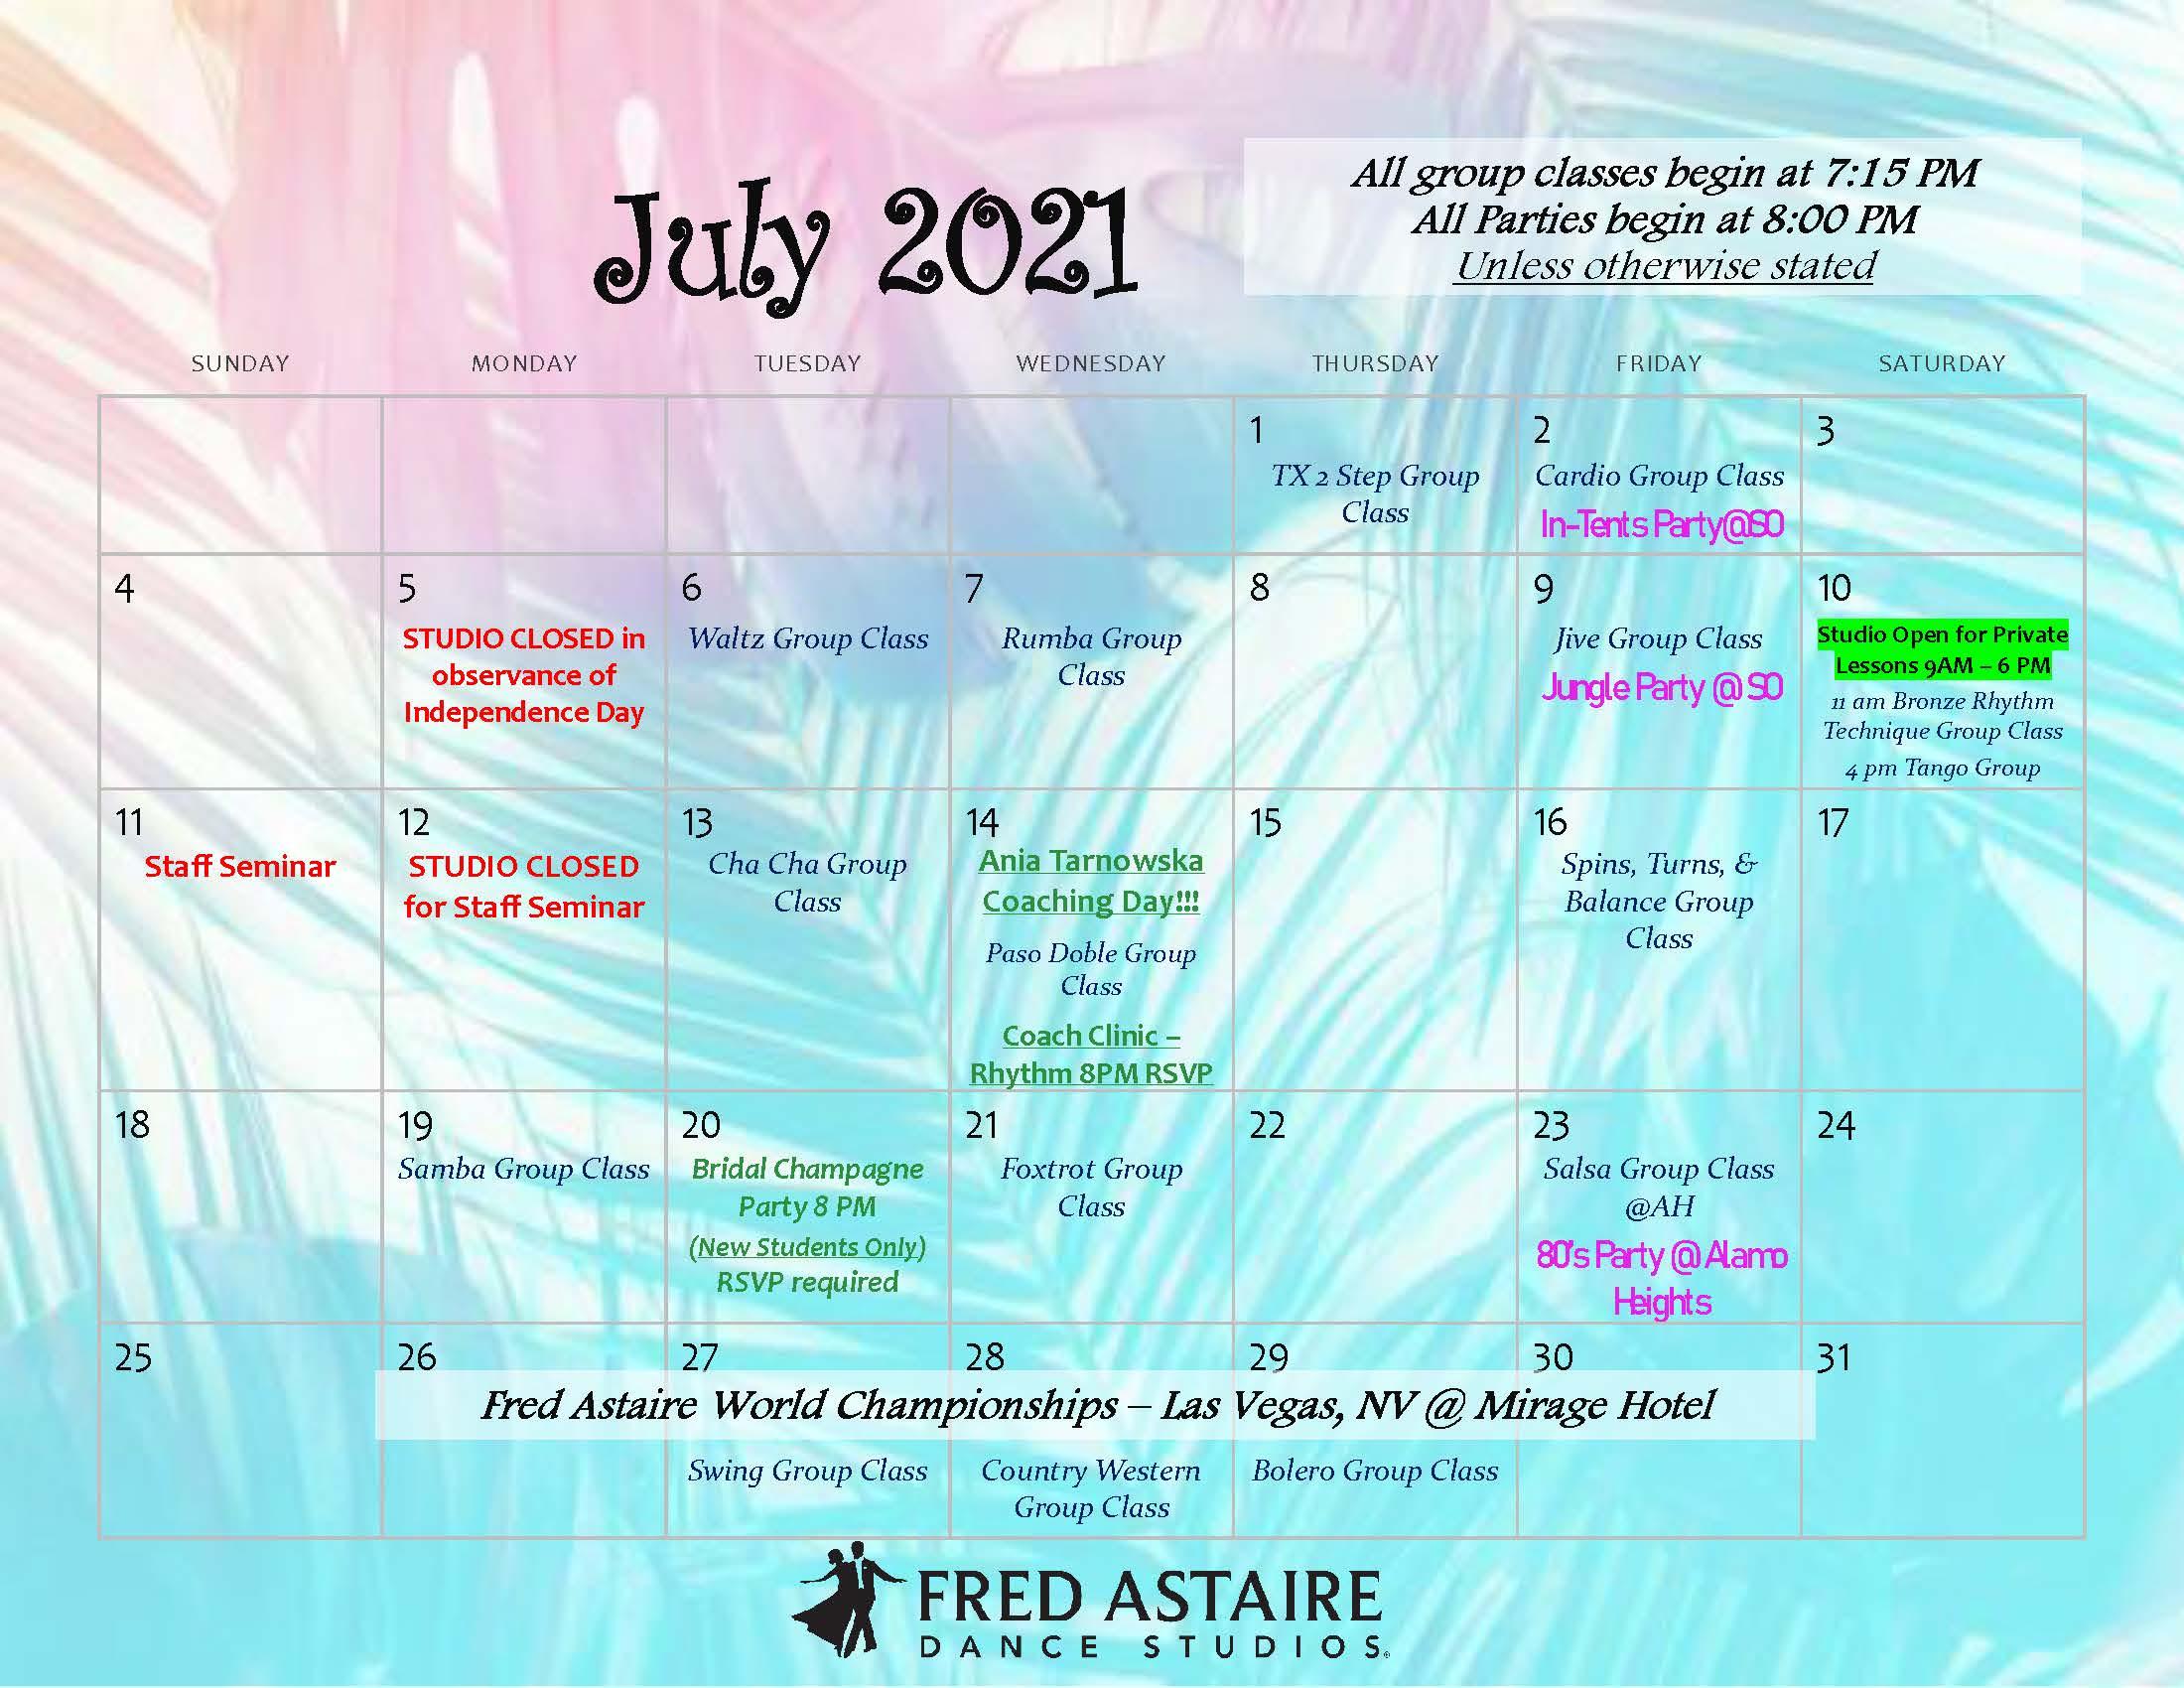 FADS Dance Calendar - Stone Oak - July